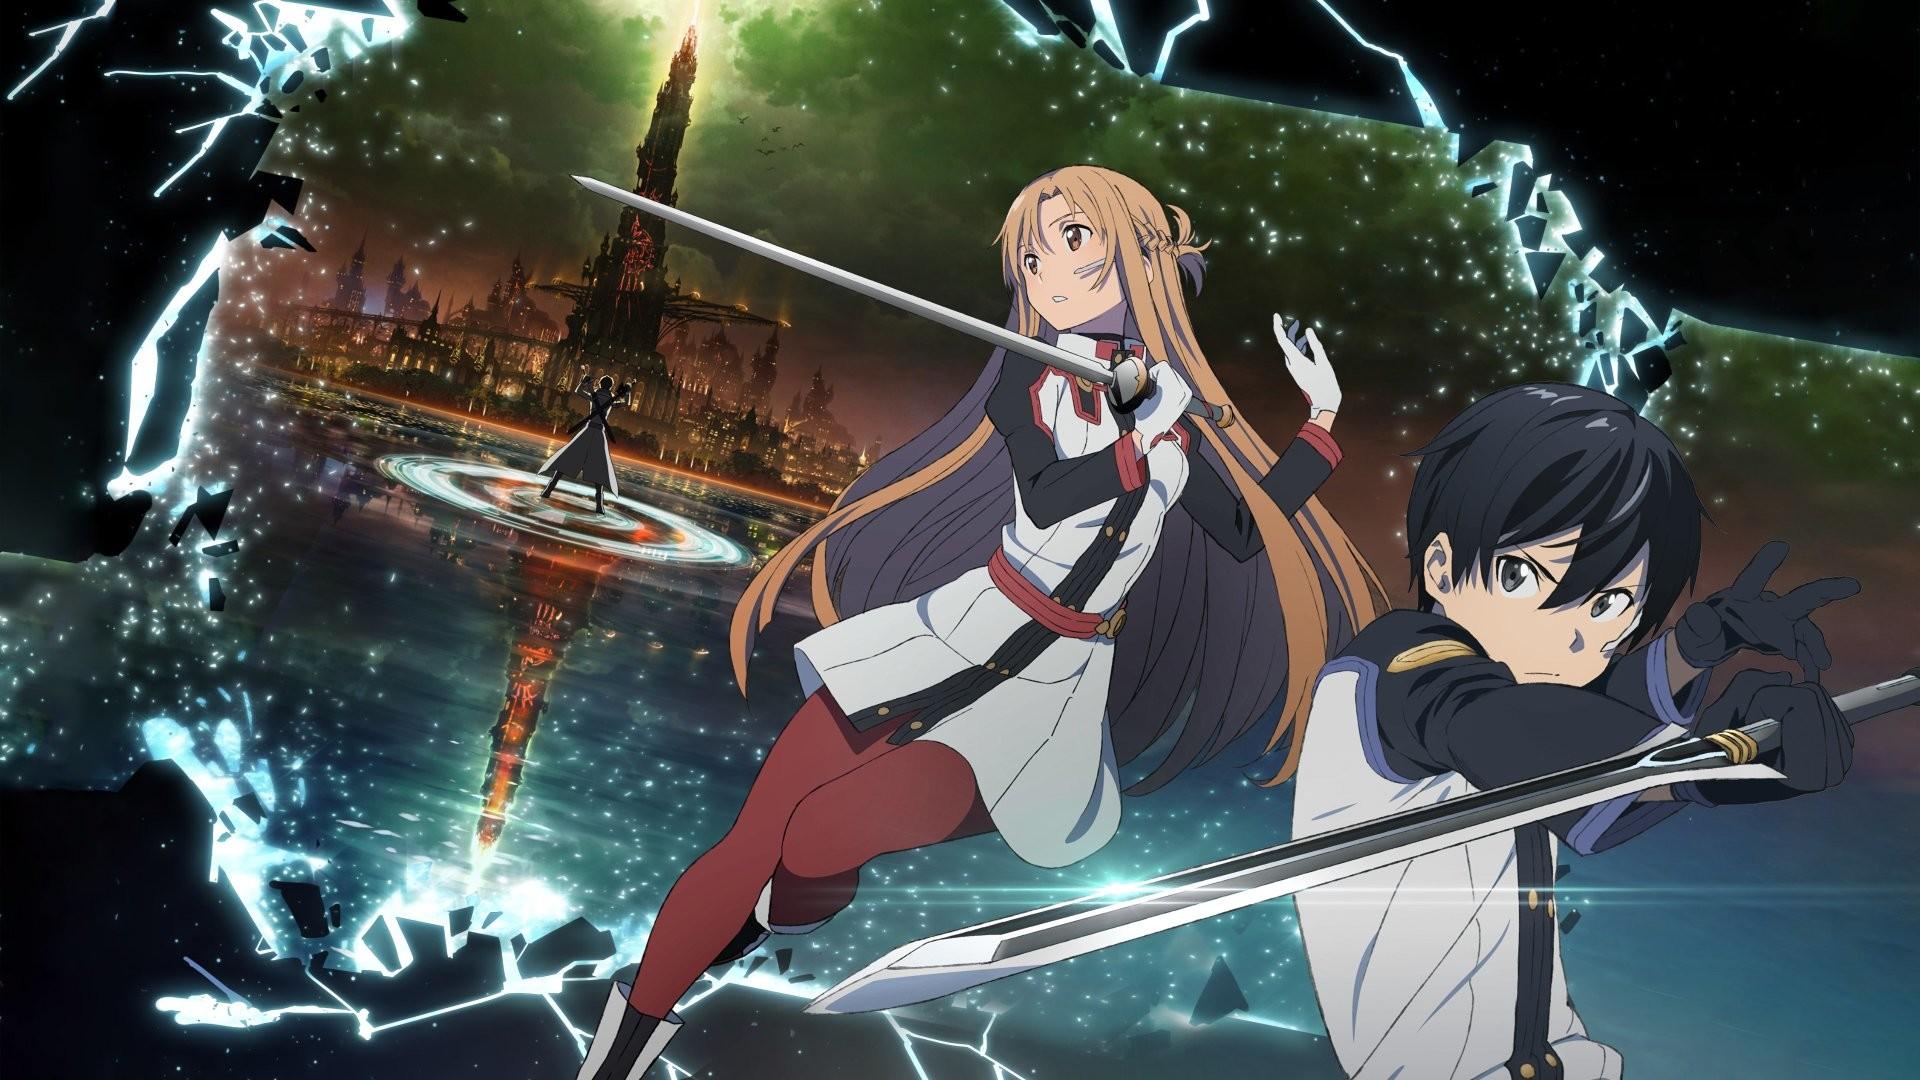 HD Wallpaper | Hintergrund ID:689248. 3840×2160 Anime Sword Art Online …